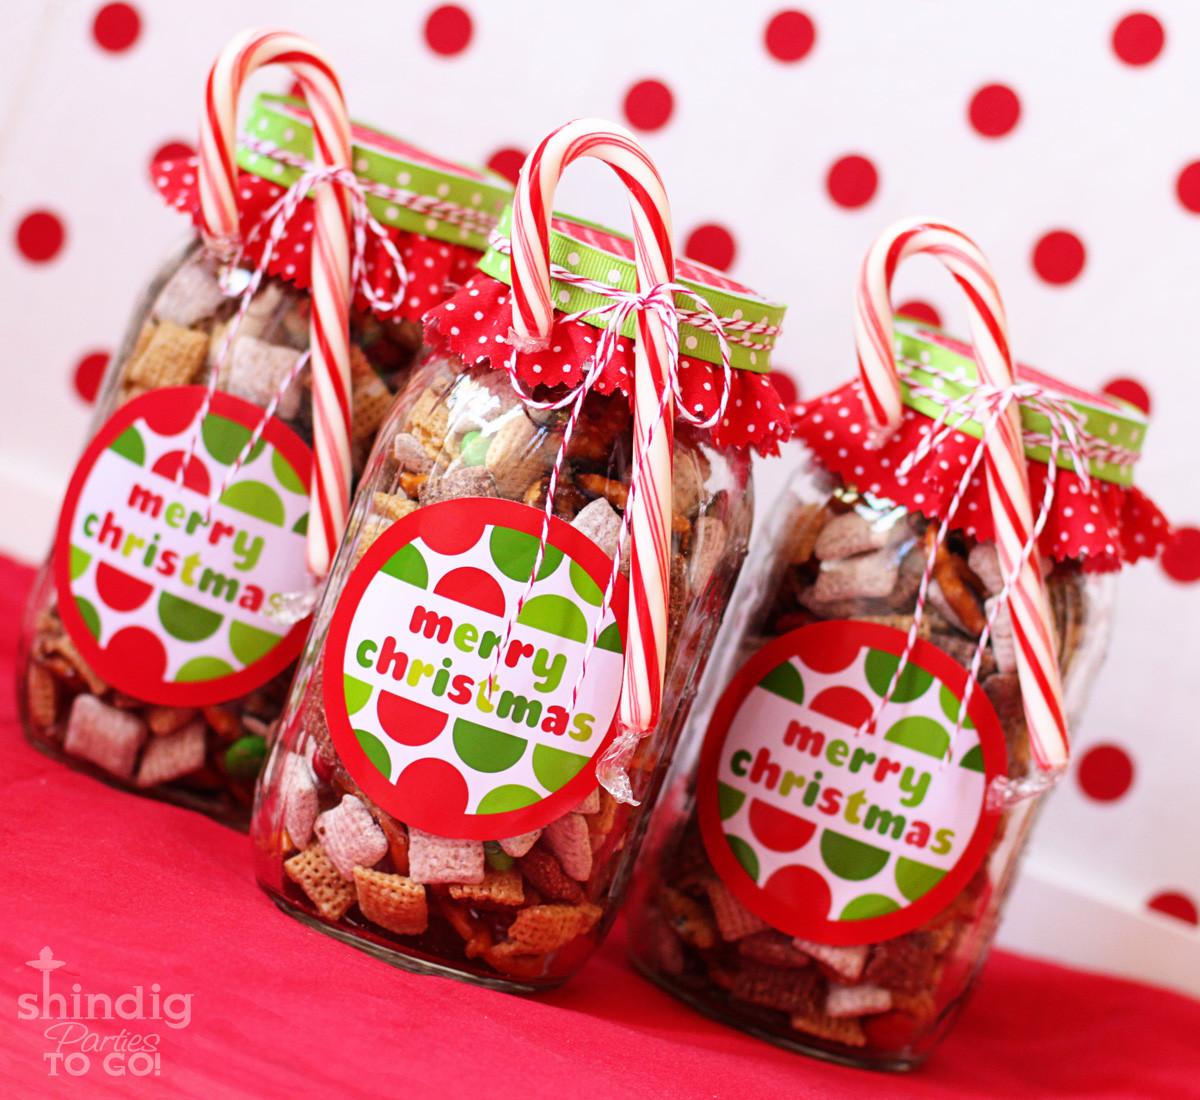 Christmas DIY Gifts  How To Make Handmade Chex Mix Holiday Gifts & Bonus Free